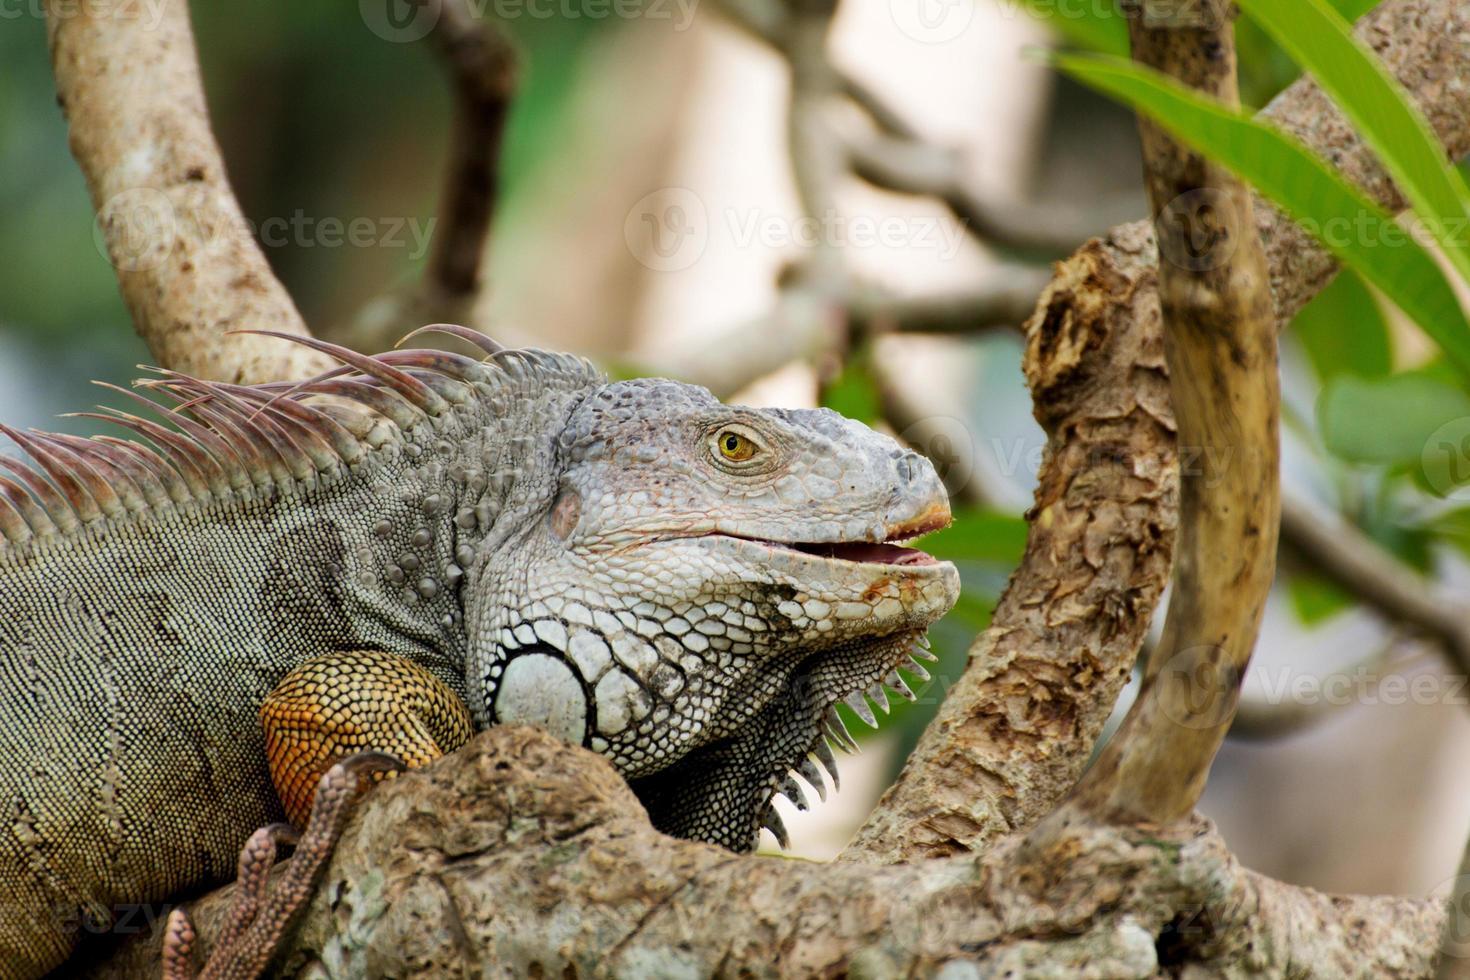 lagarto iguana trepando un árbol en la naturaleza foto